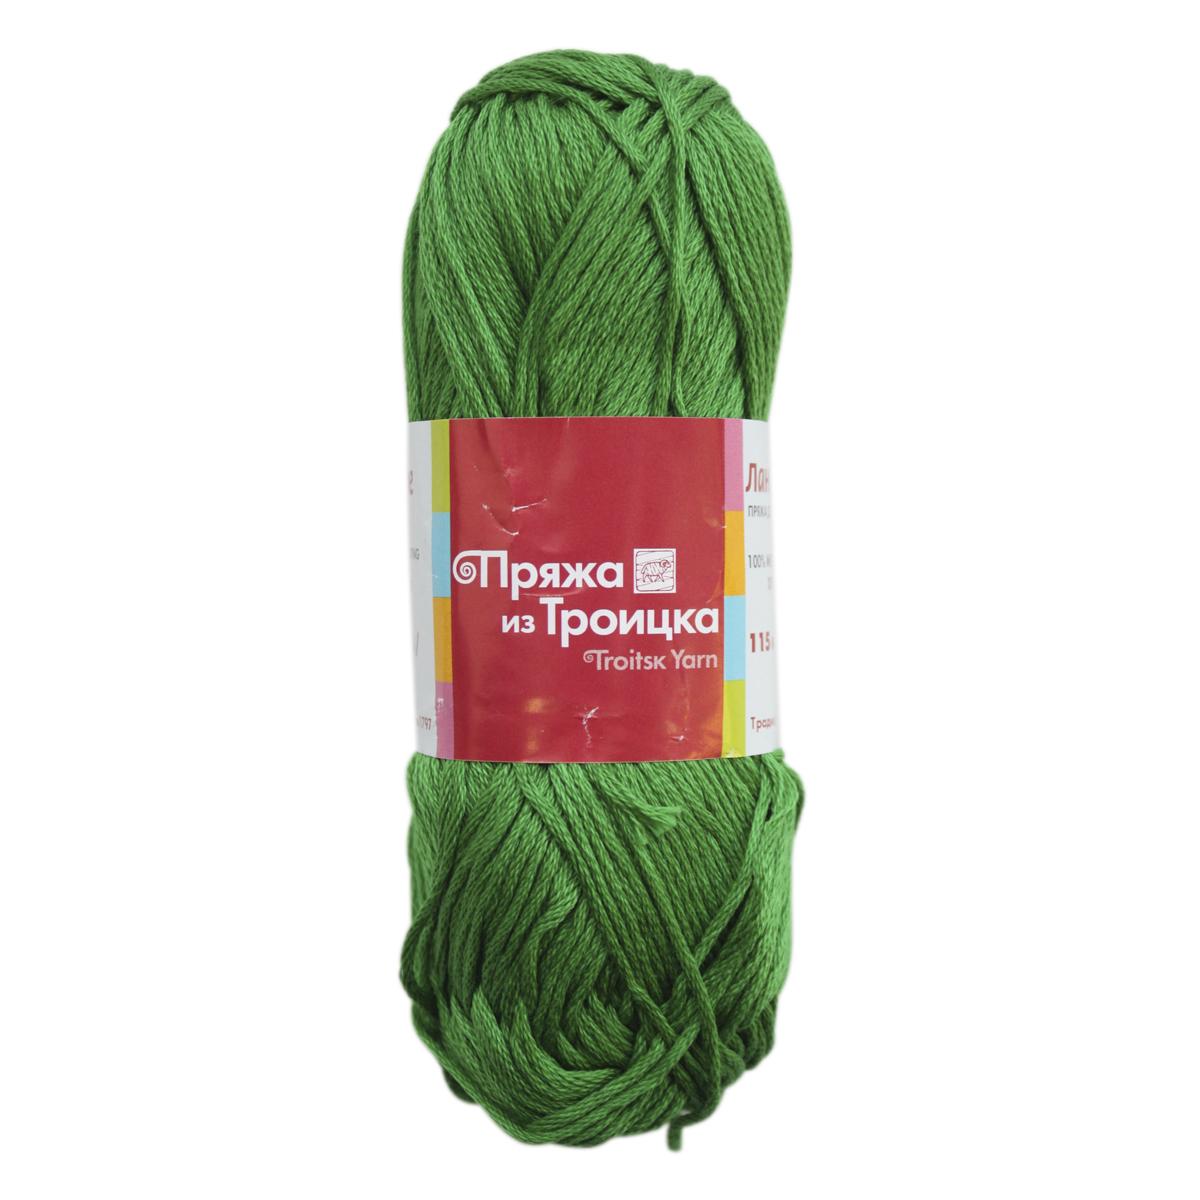 Пряжа для вязания Ландыш, 50 г, 115 м, цвет: 0726 яркая зелень, 10 шт366131_0726